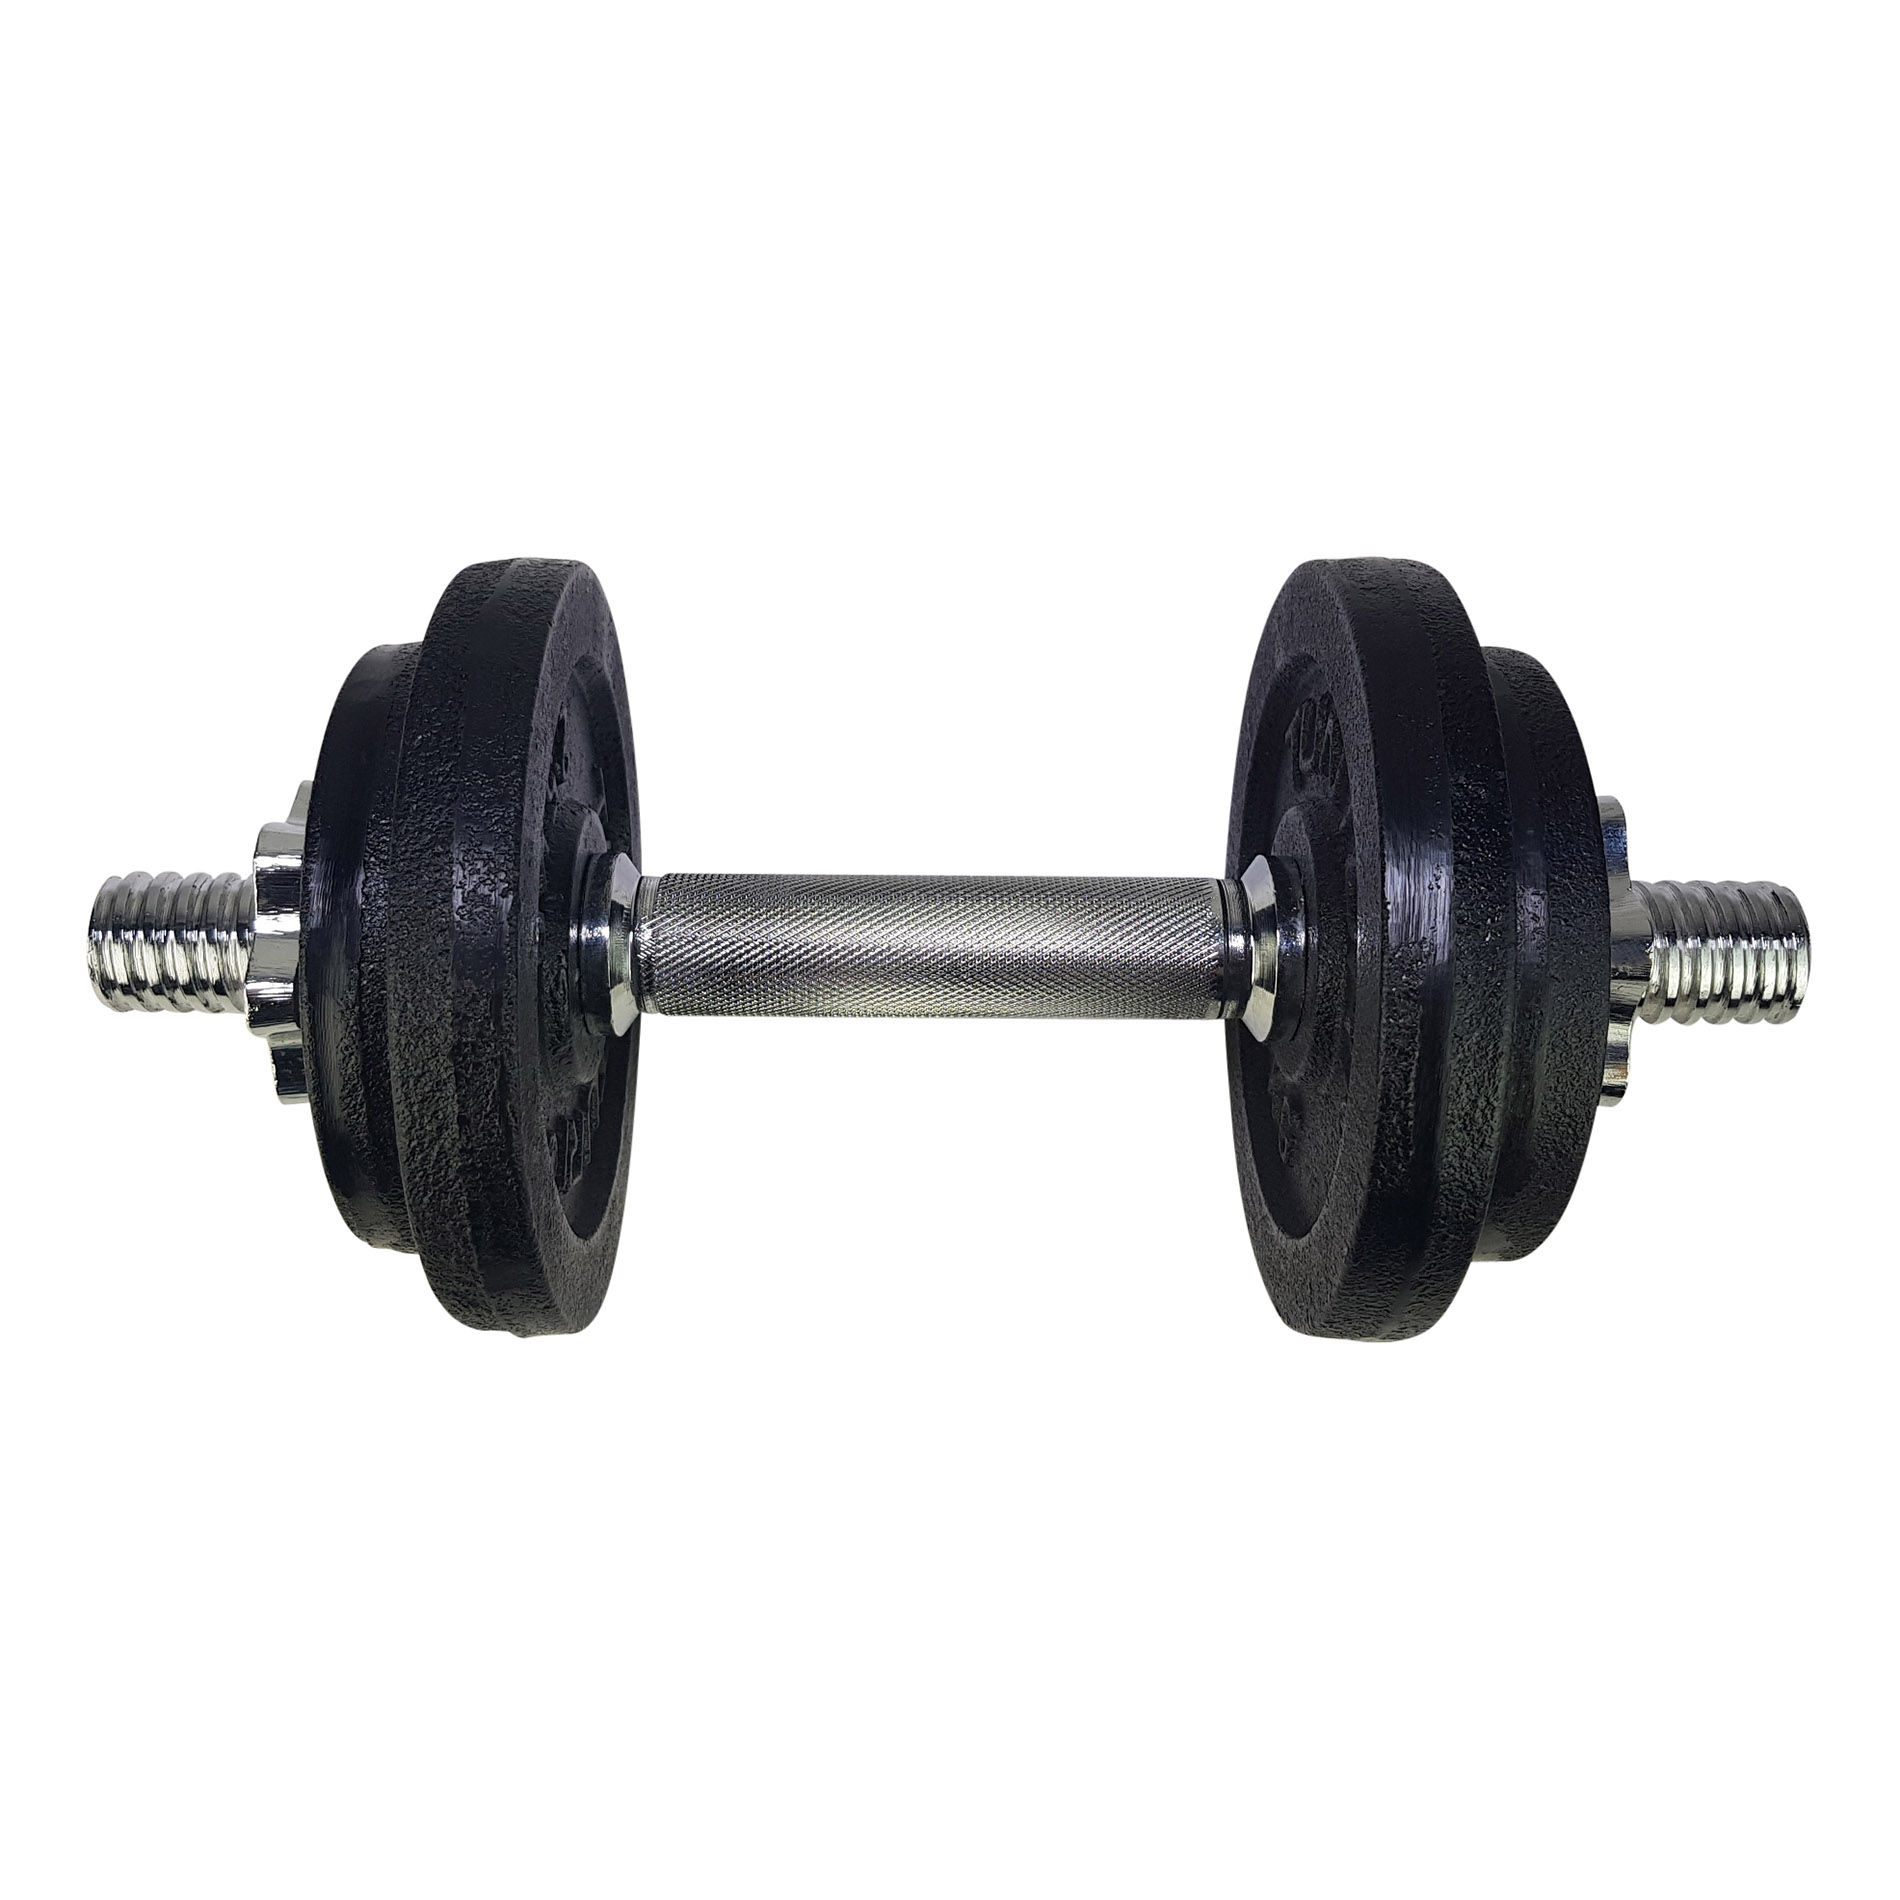 Dumbbellset, with 1 bar screw